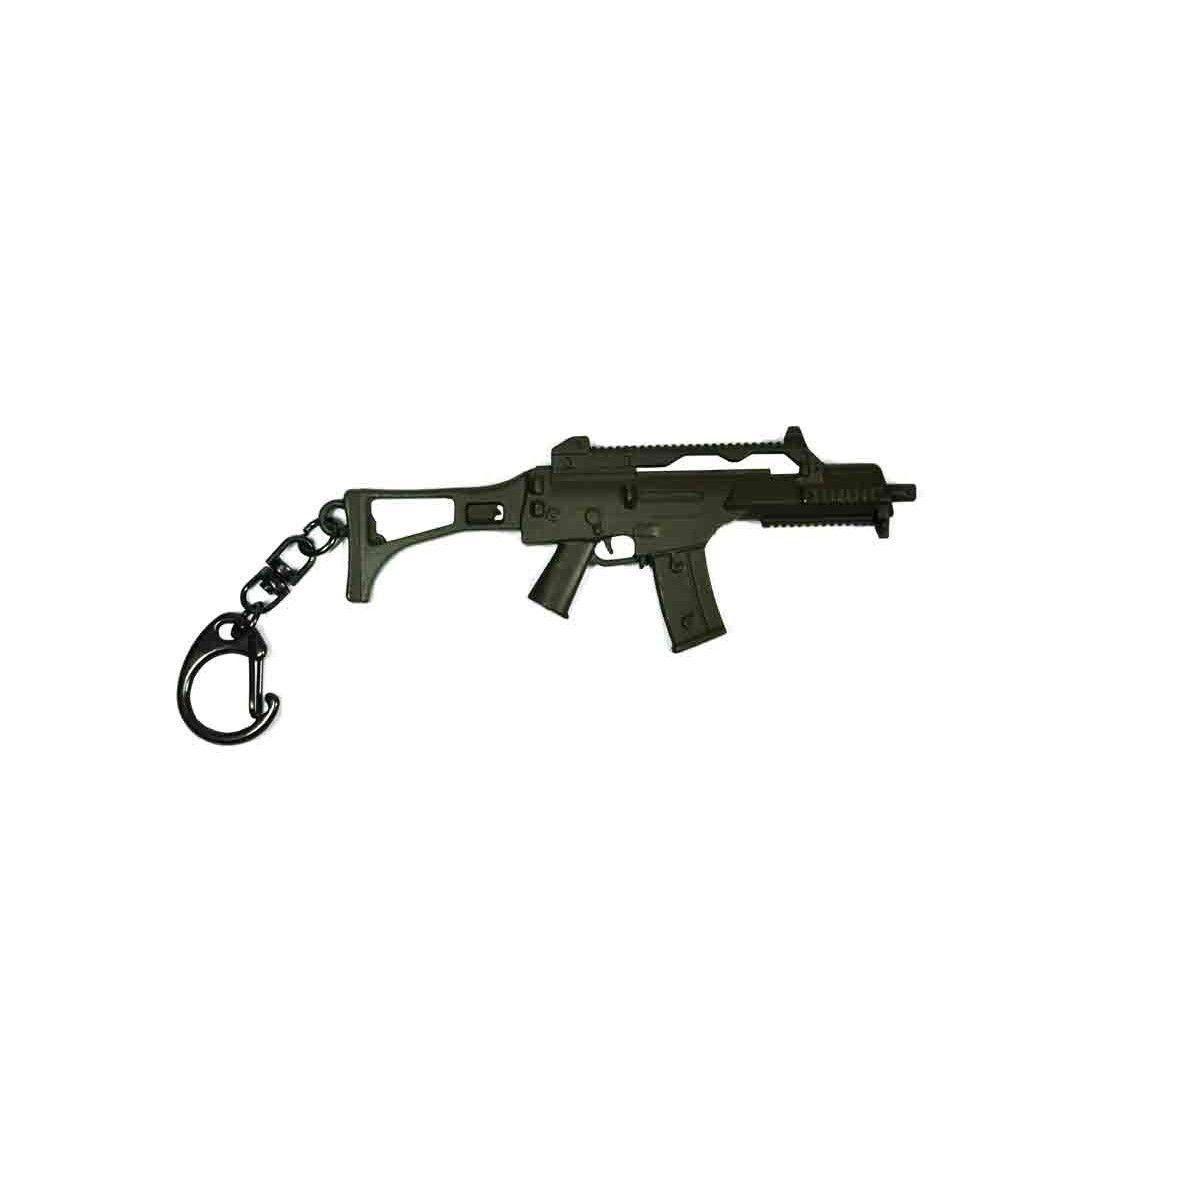 Chaveiro em Metal modelo Rifle G36 - Arsenal Guns  - Combat Airsoft